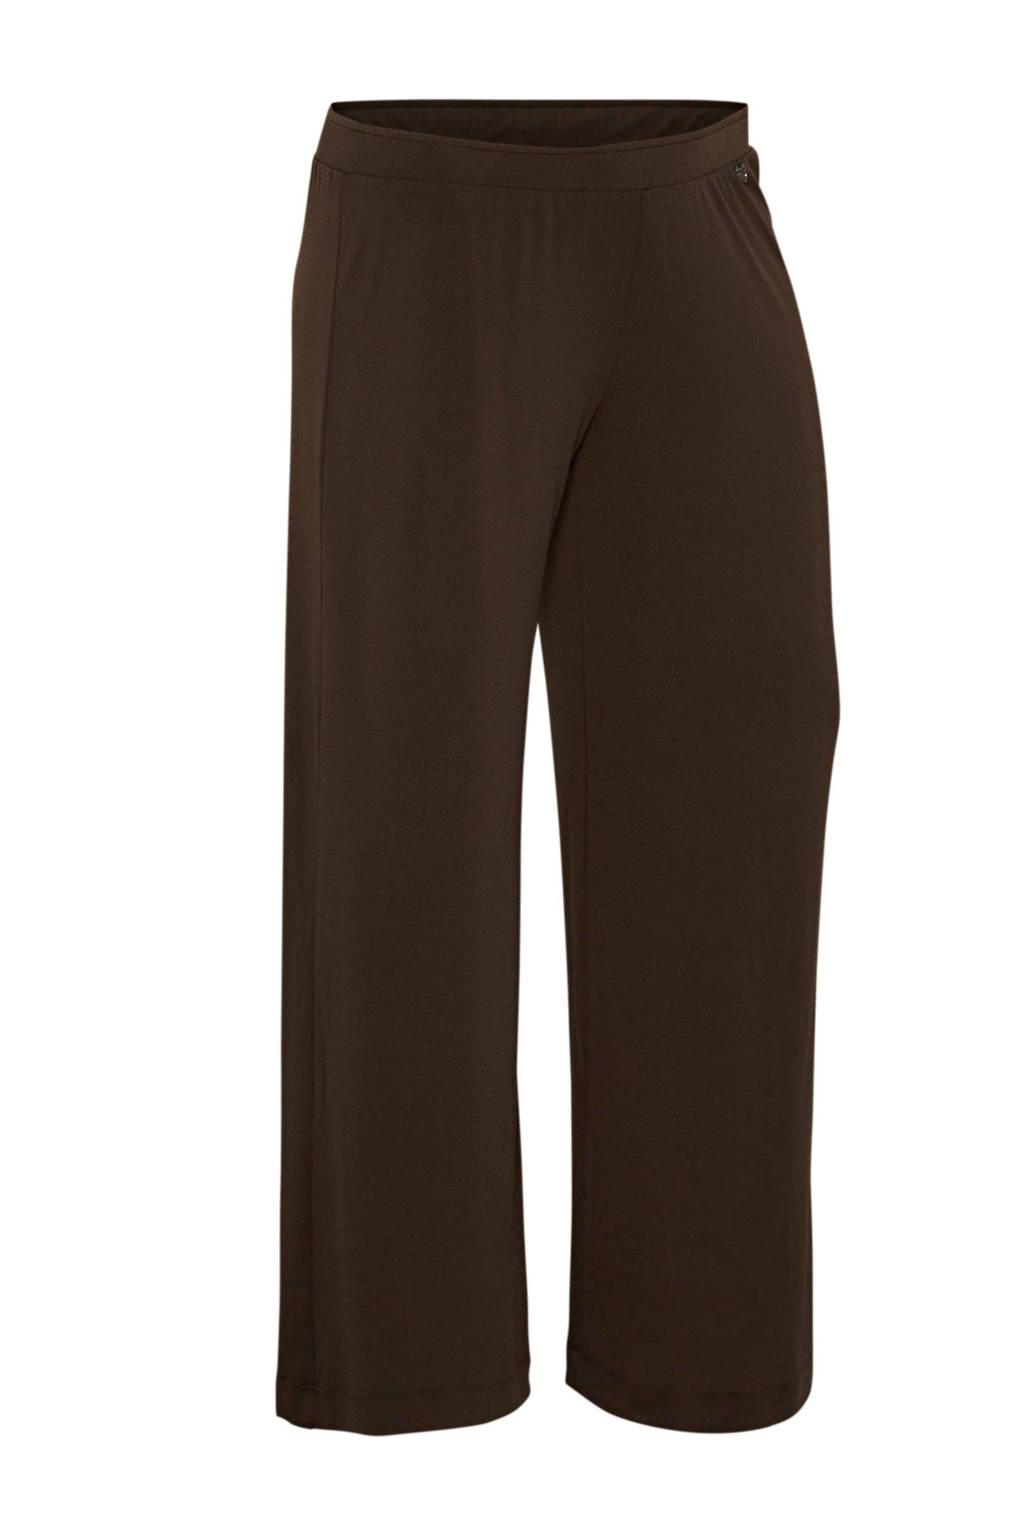 Mat Fashion jersey broek bruin, Bruin